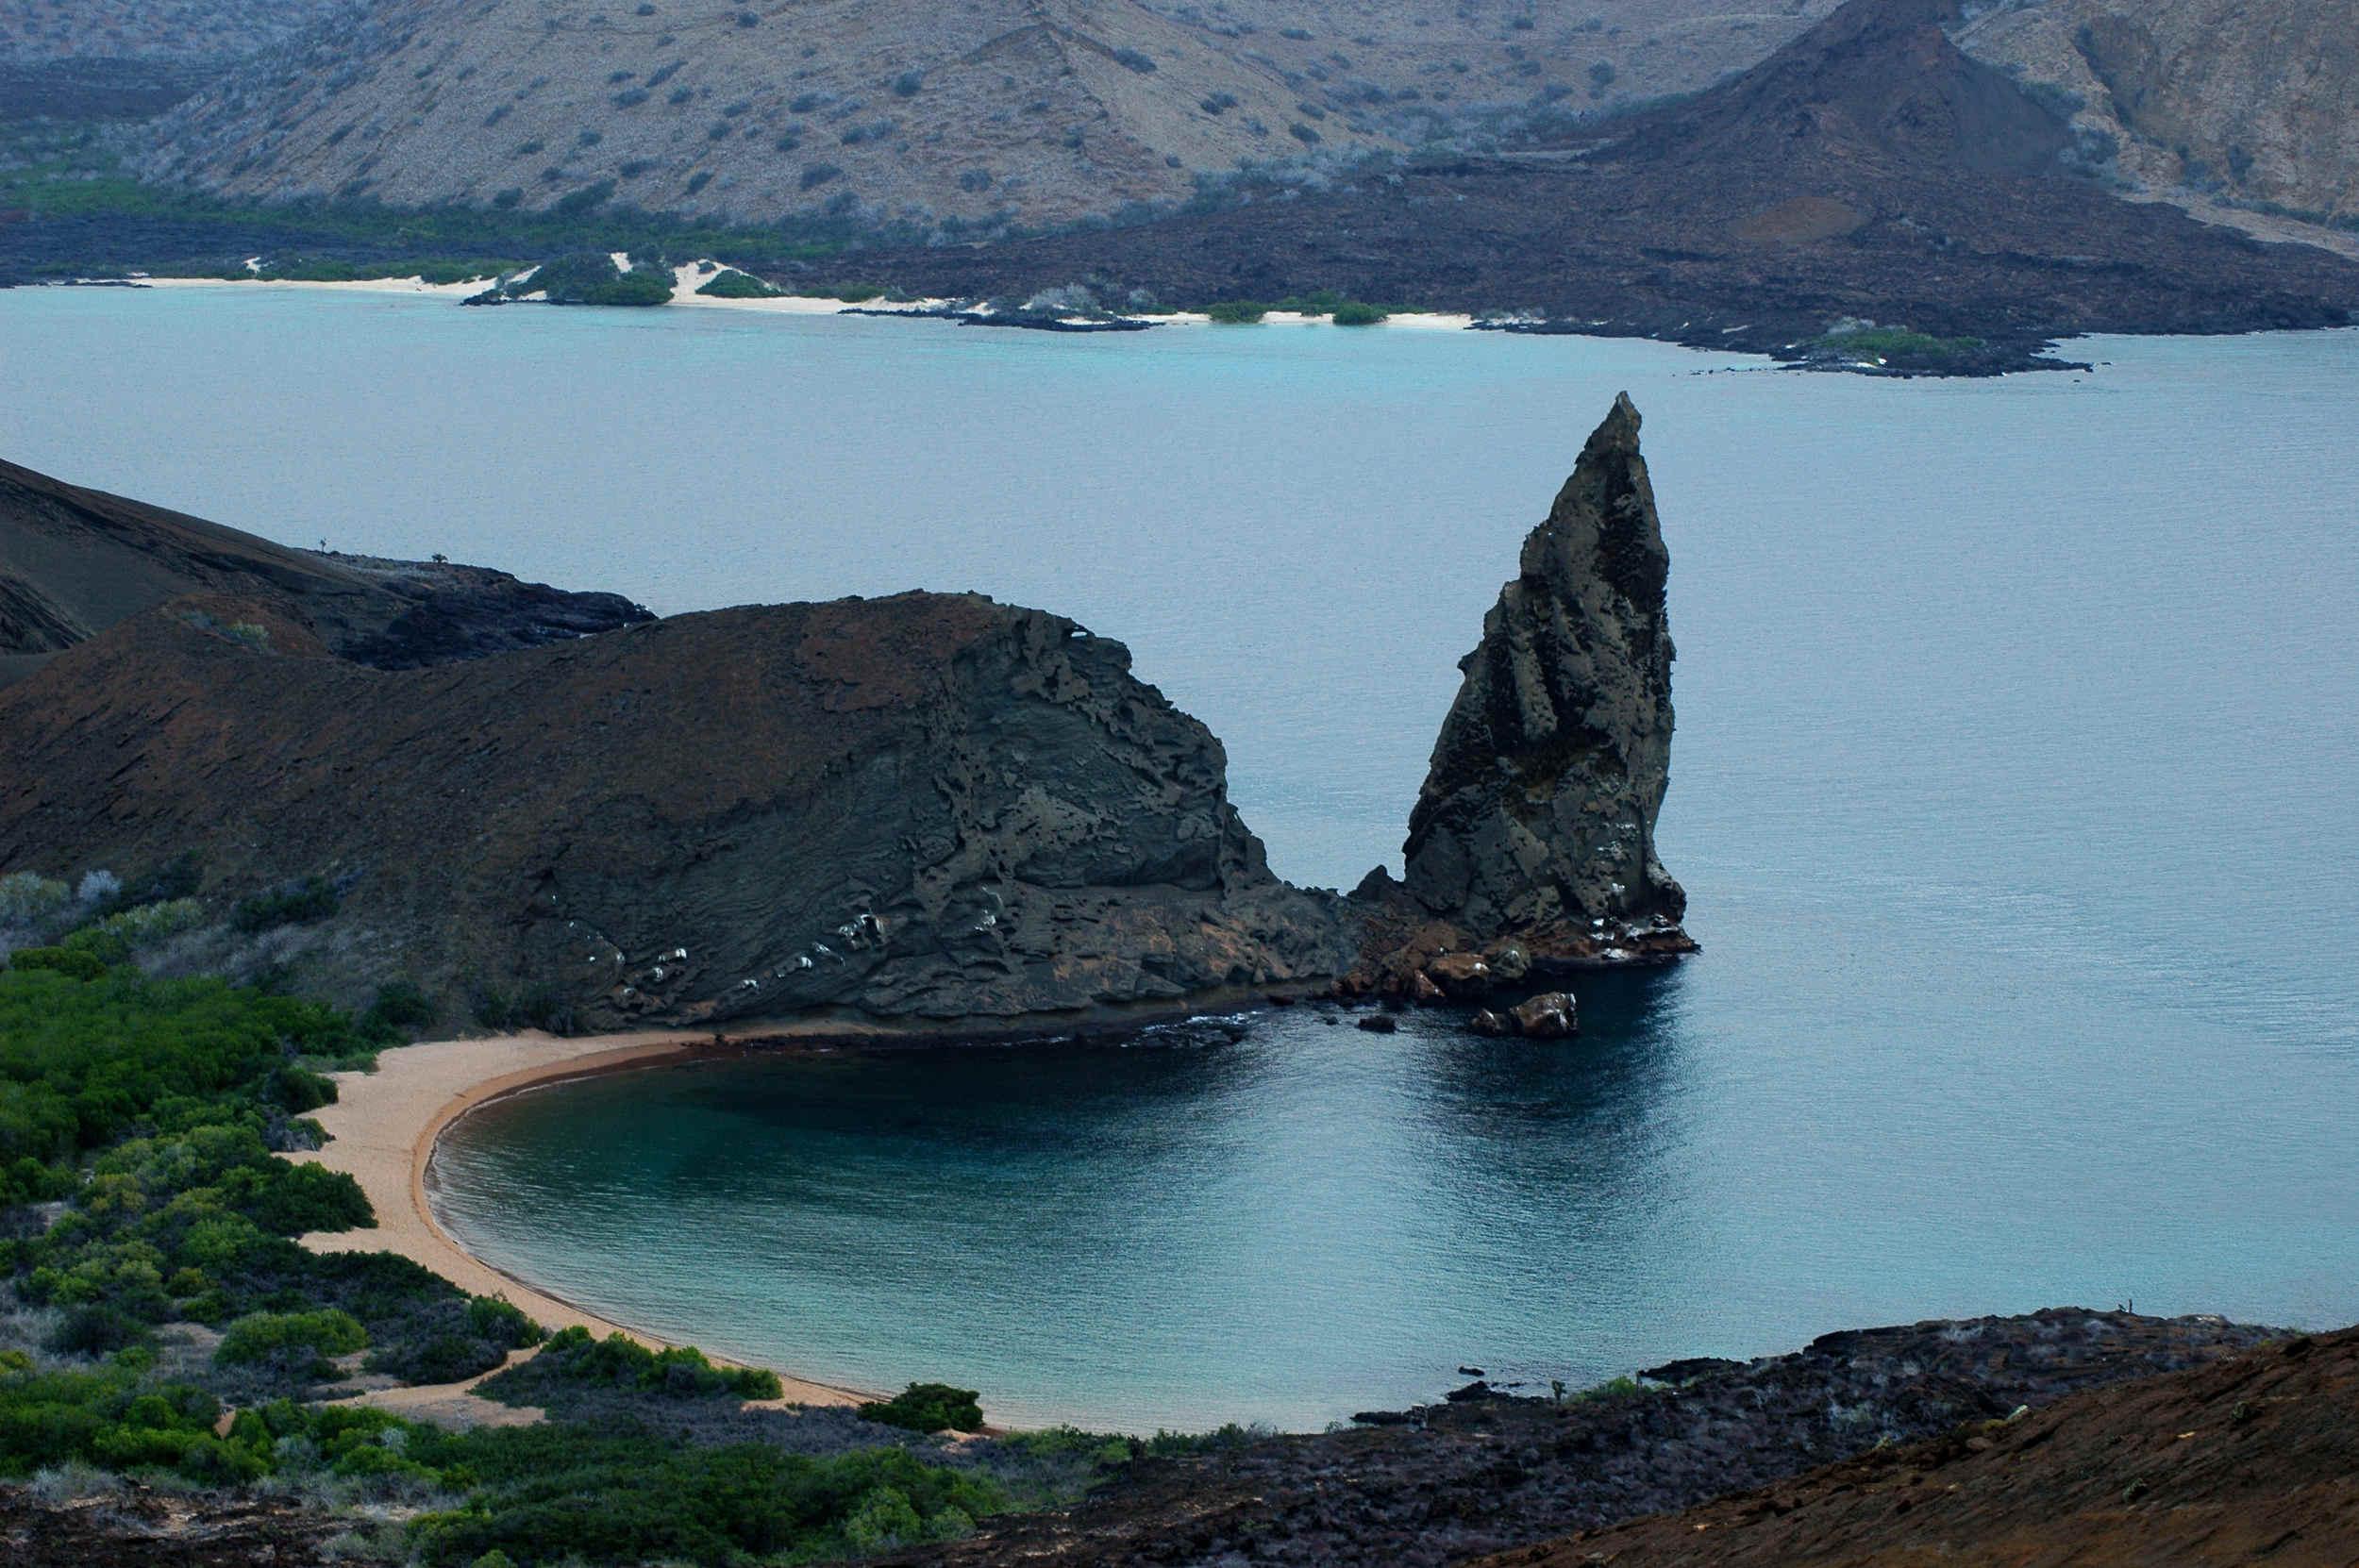 Pinnacle Rock, Galapagos Islands